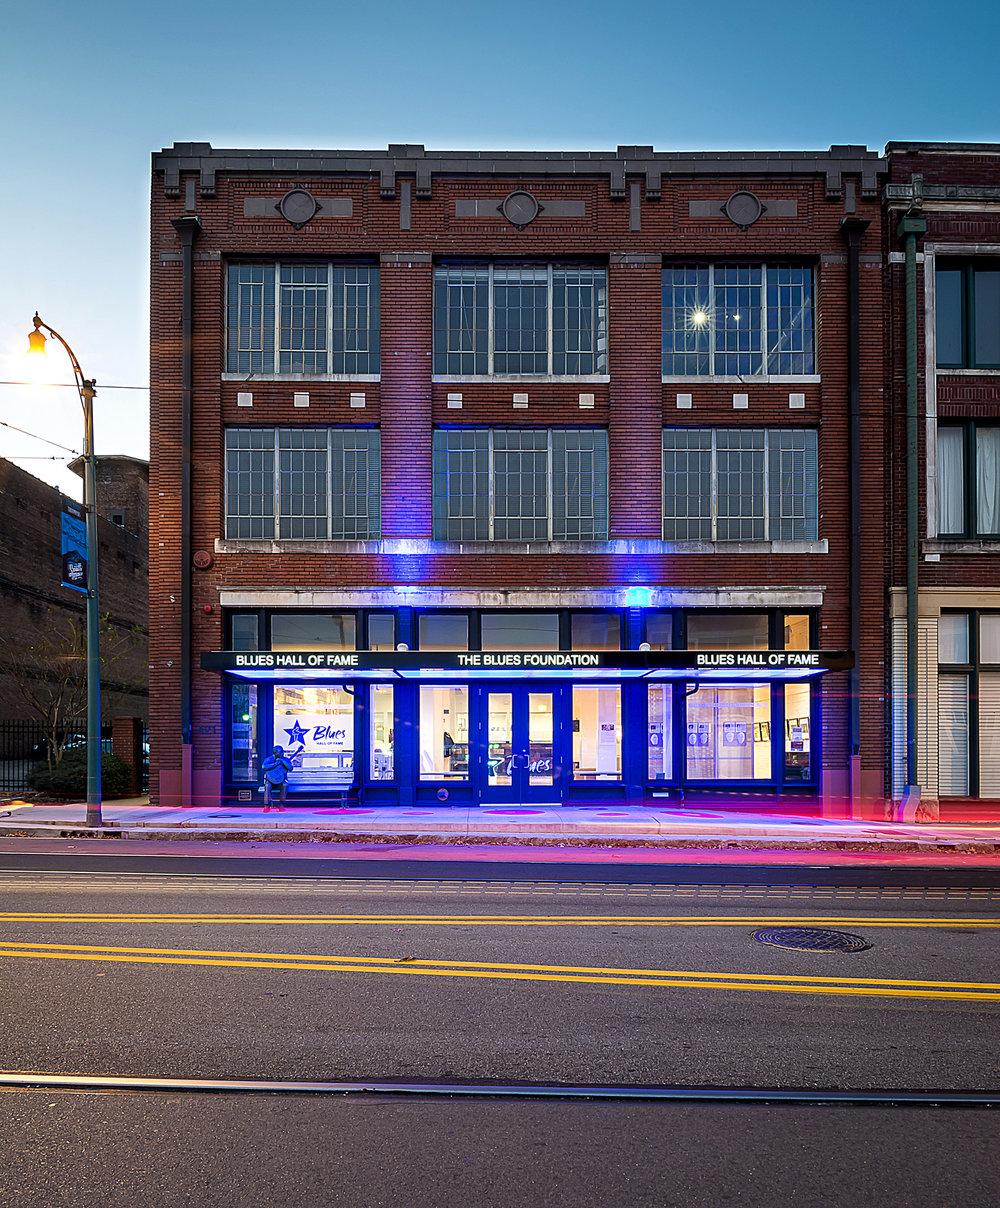 Blues foundation_Dusk Exterior (1 of 4).jpg